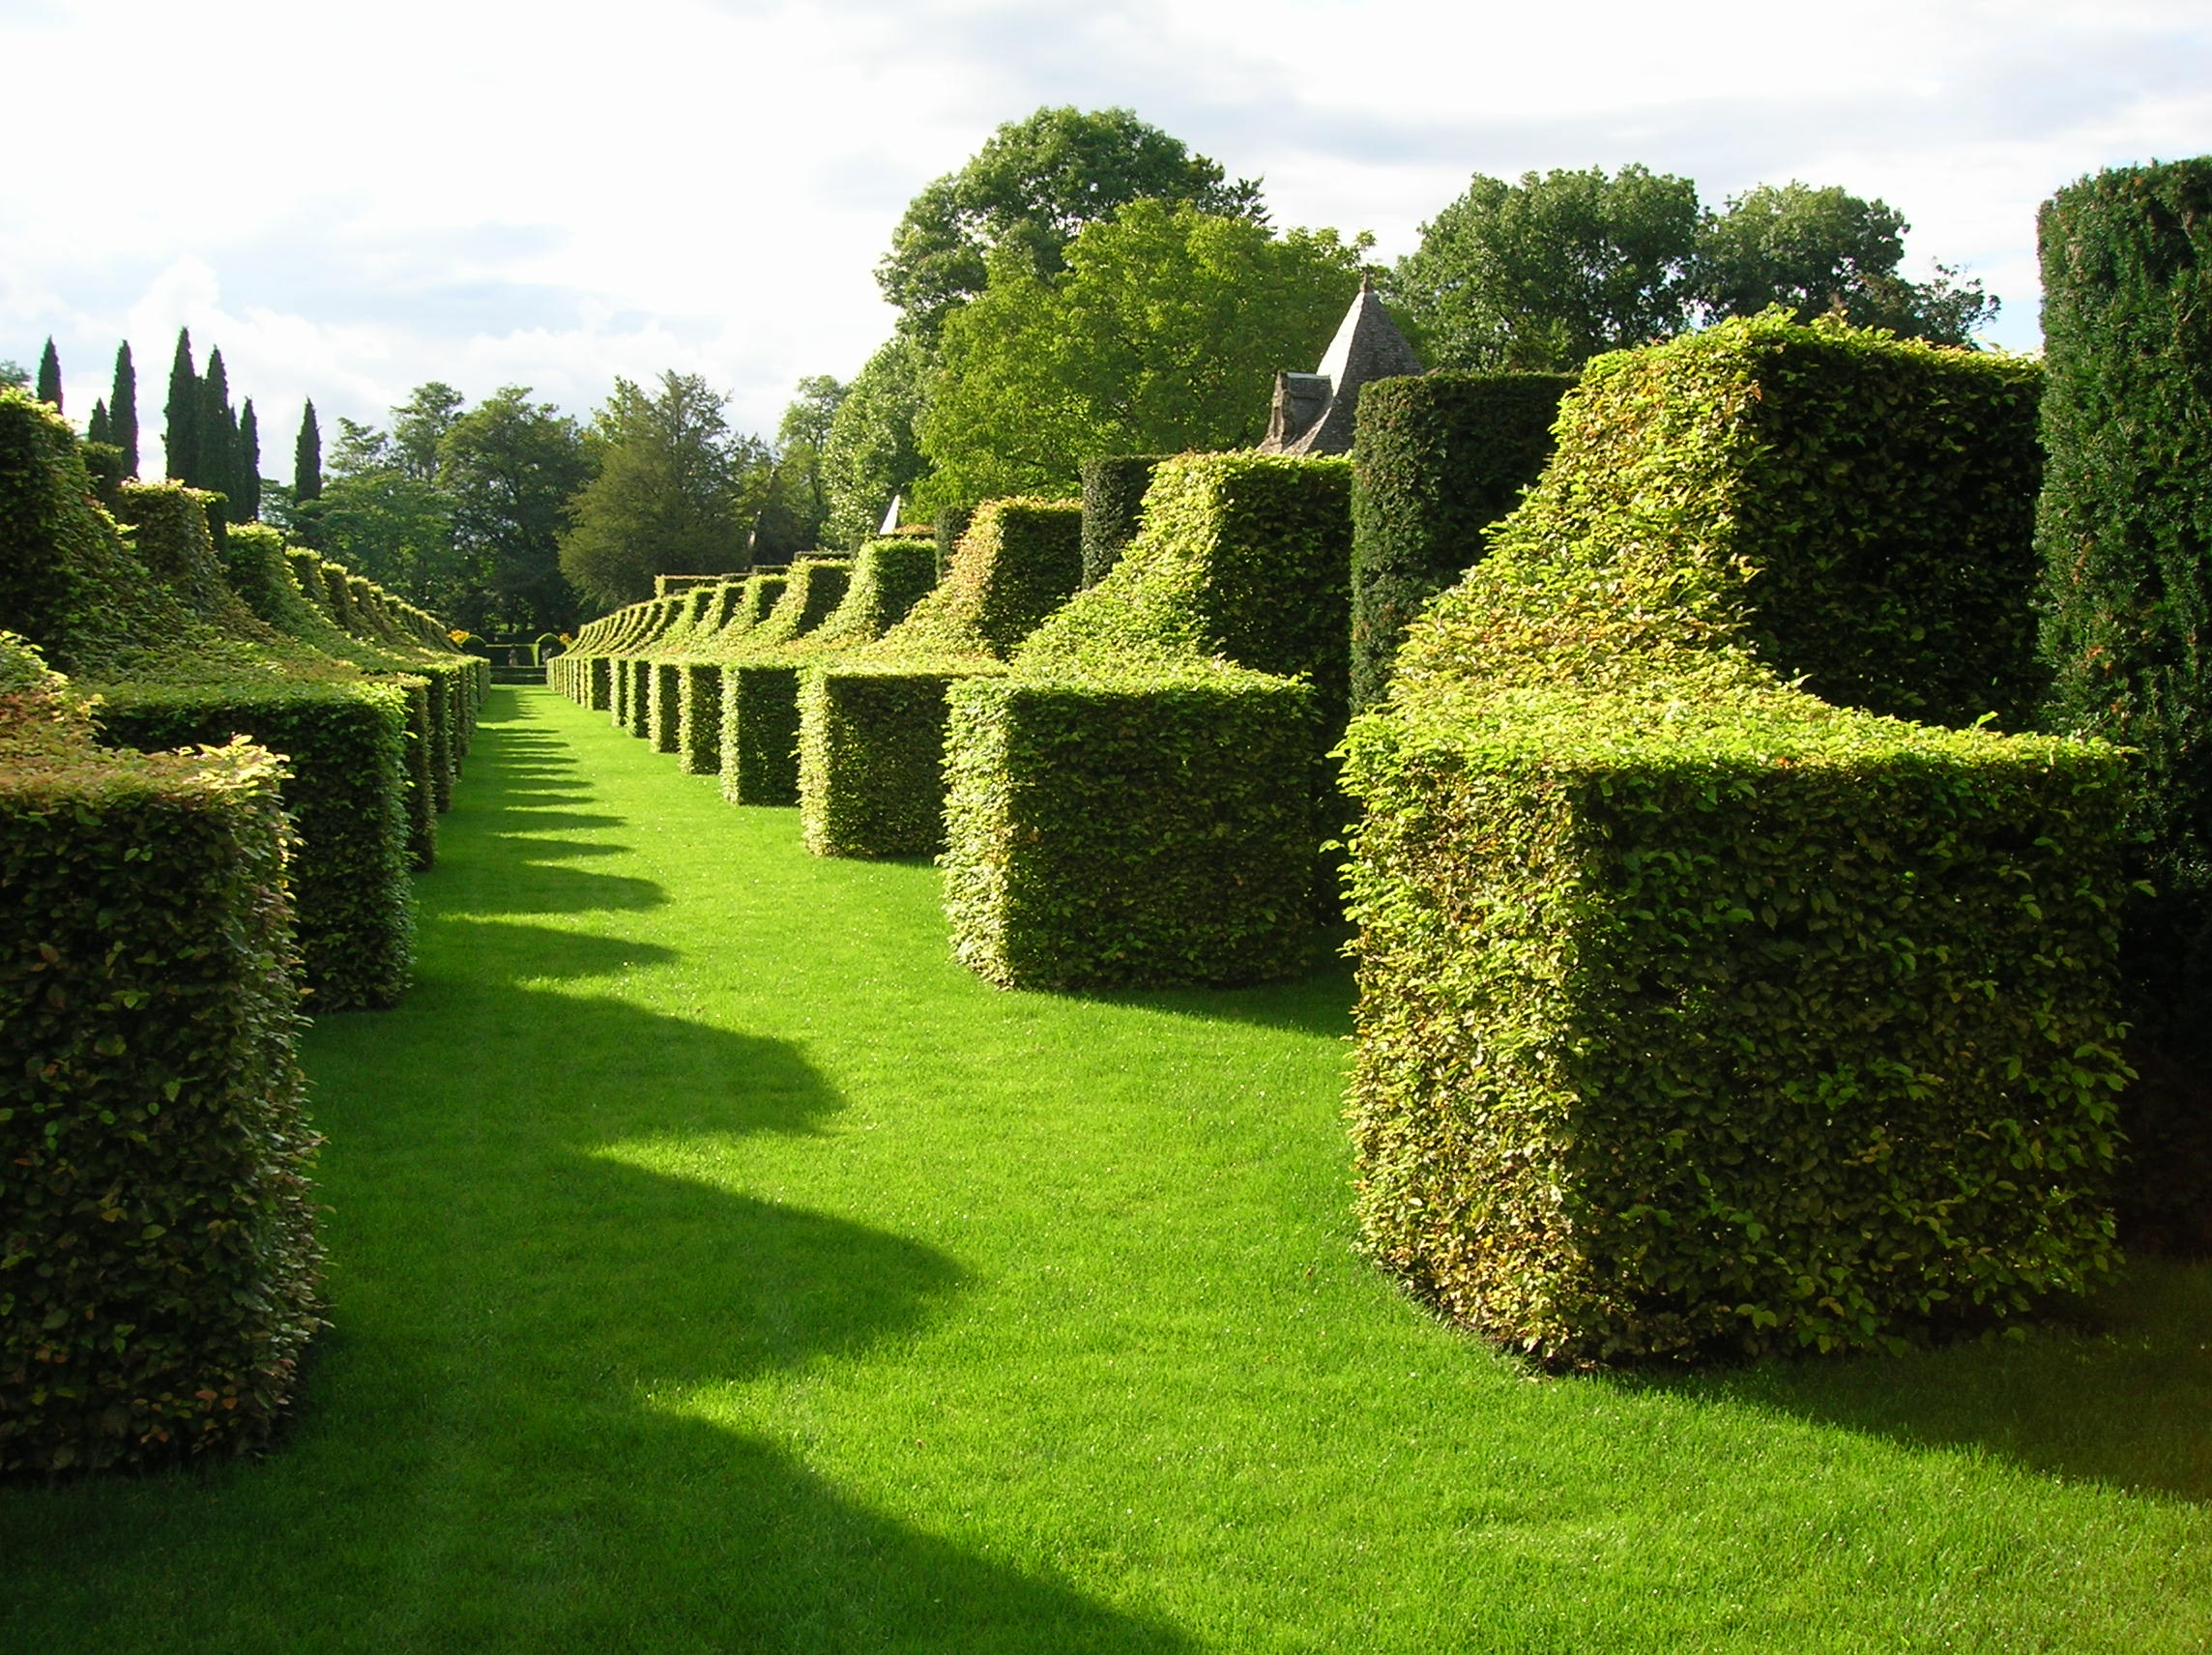 Garden Design Garden Design with The Rose Garden at Woodland